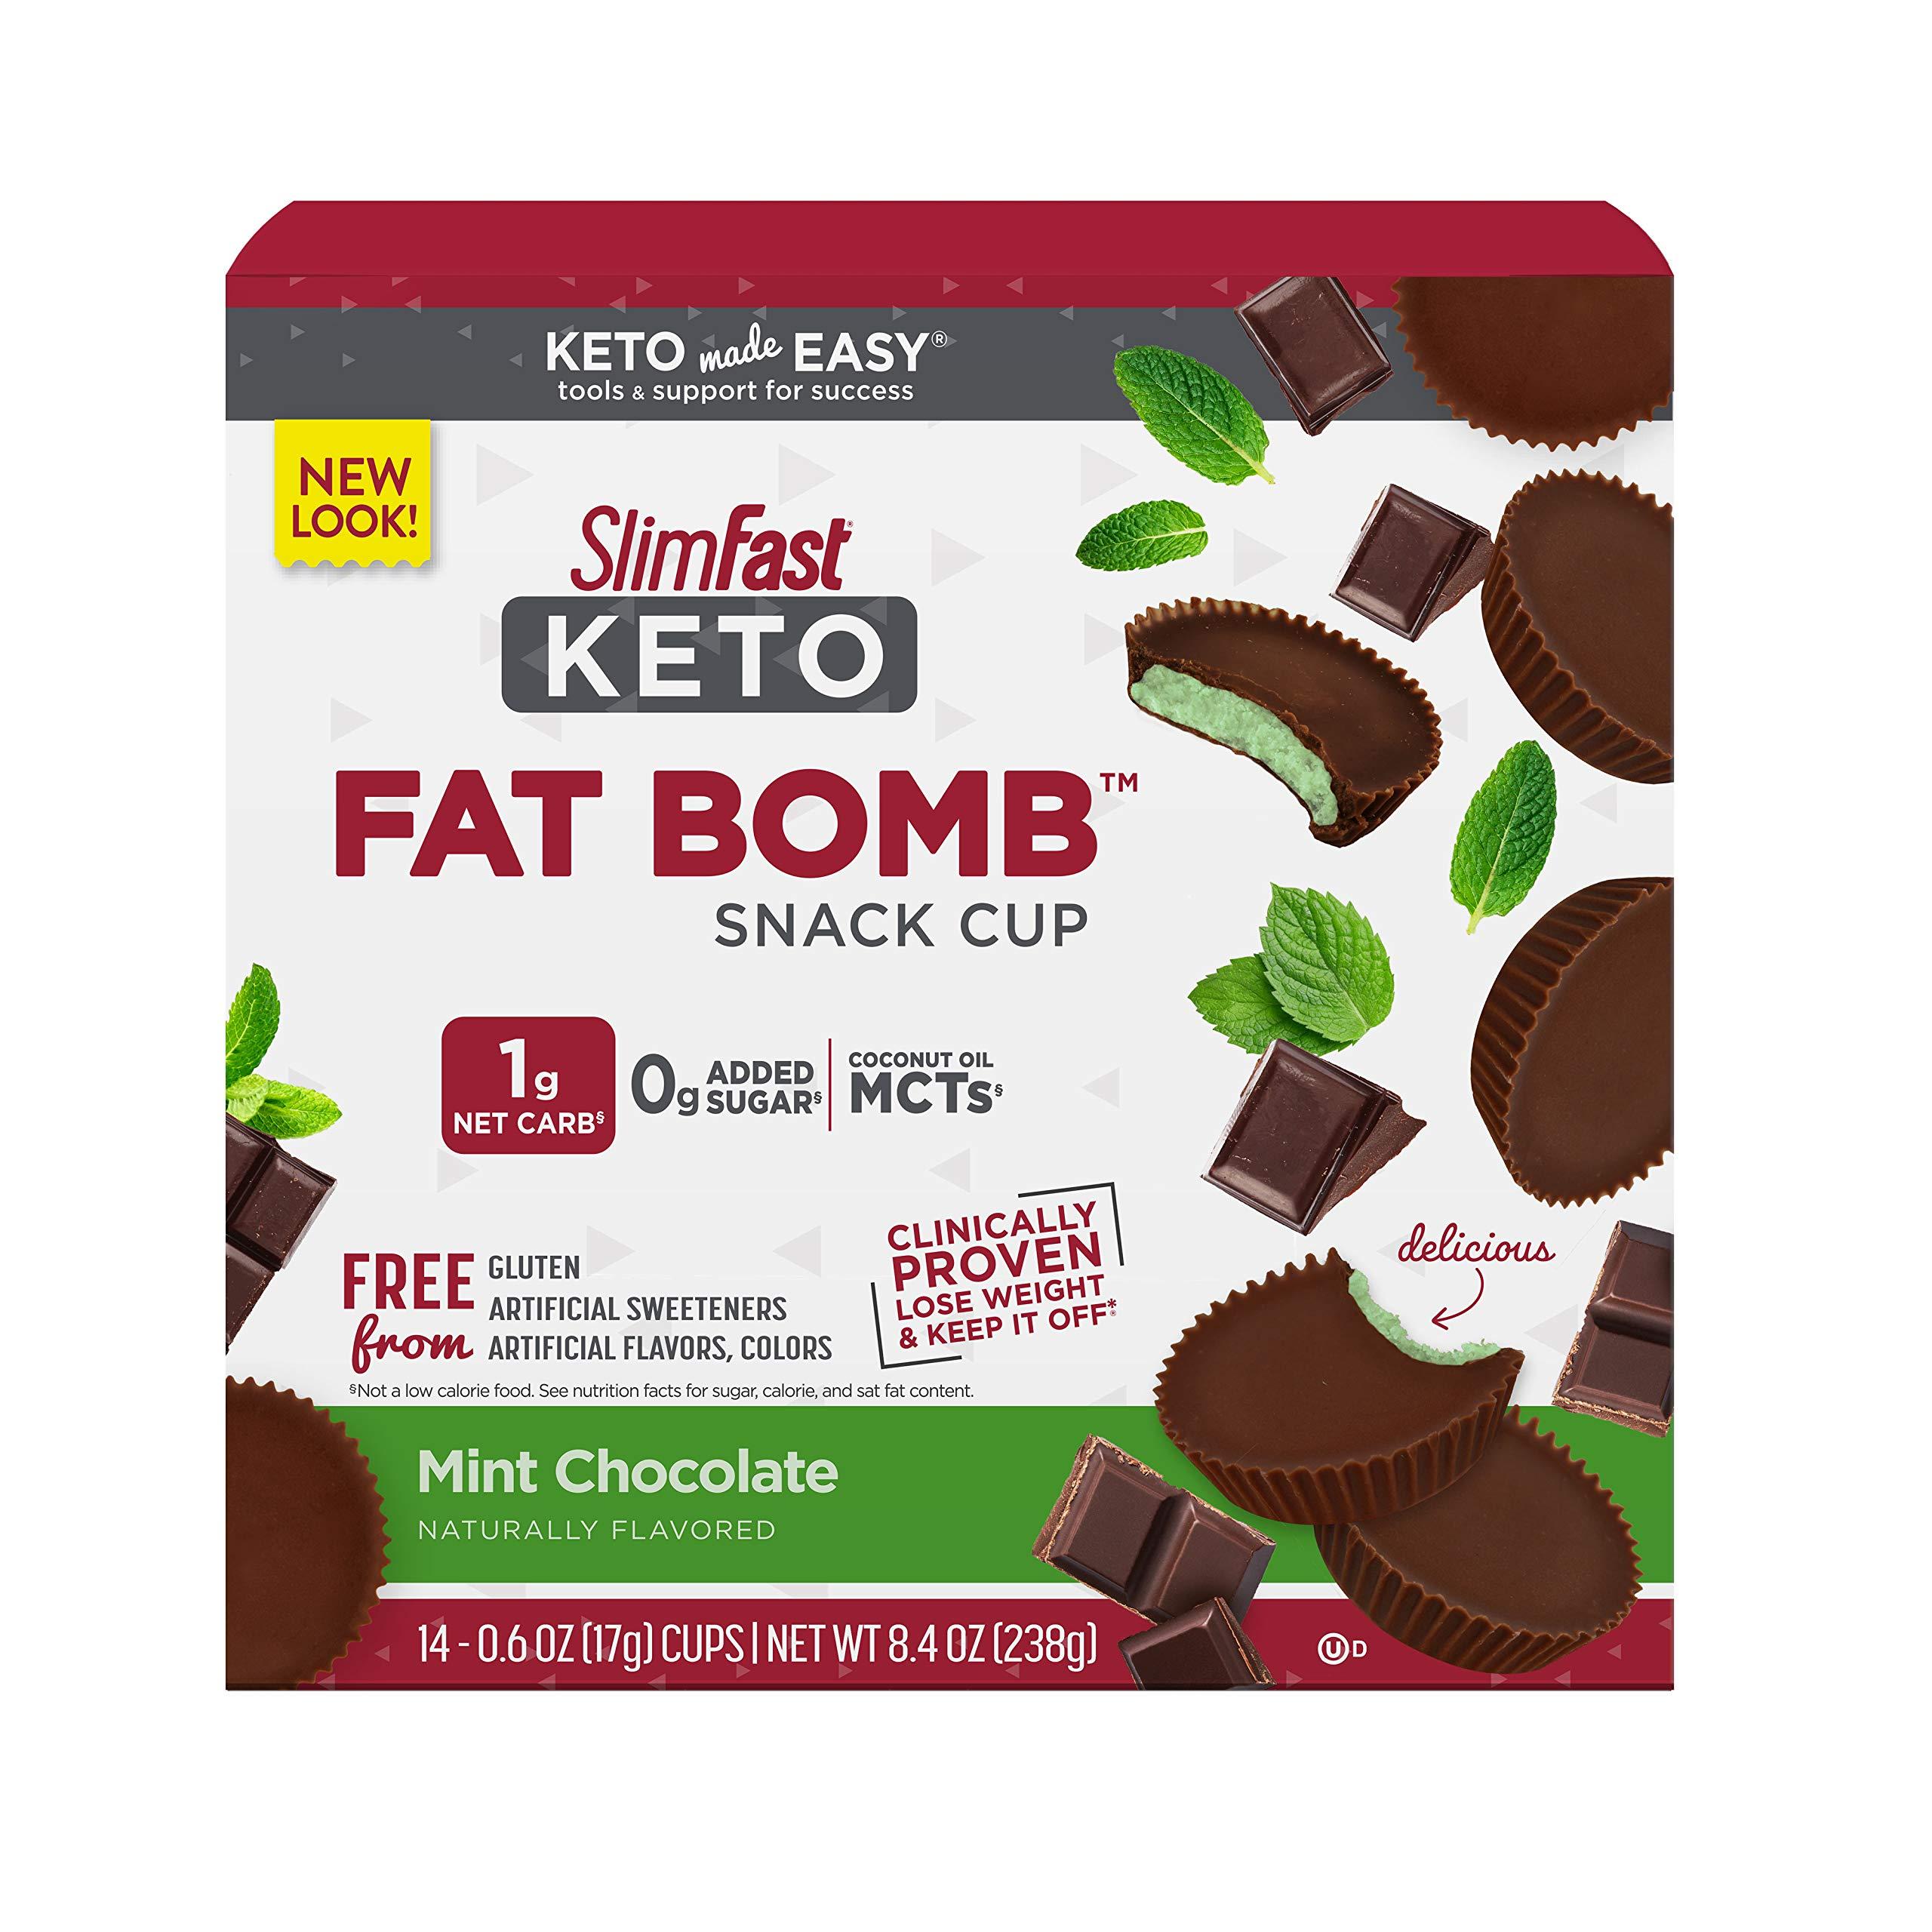 SlimFast Keto Fat Bomb Snacks - Mint Chocolate - 14 Count Box - Pantry Friendly